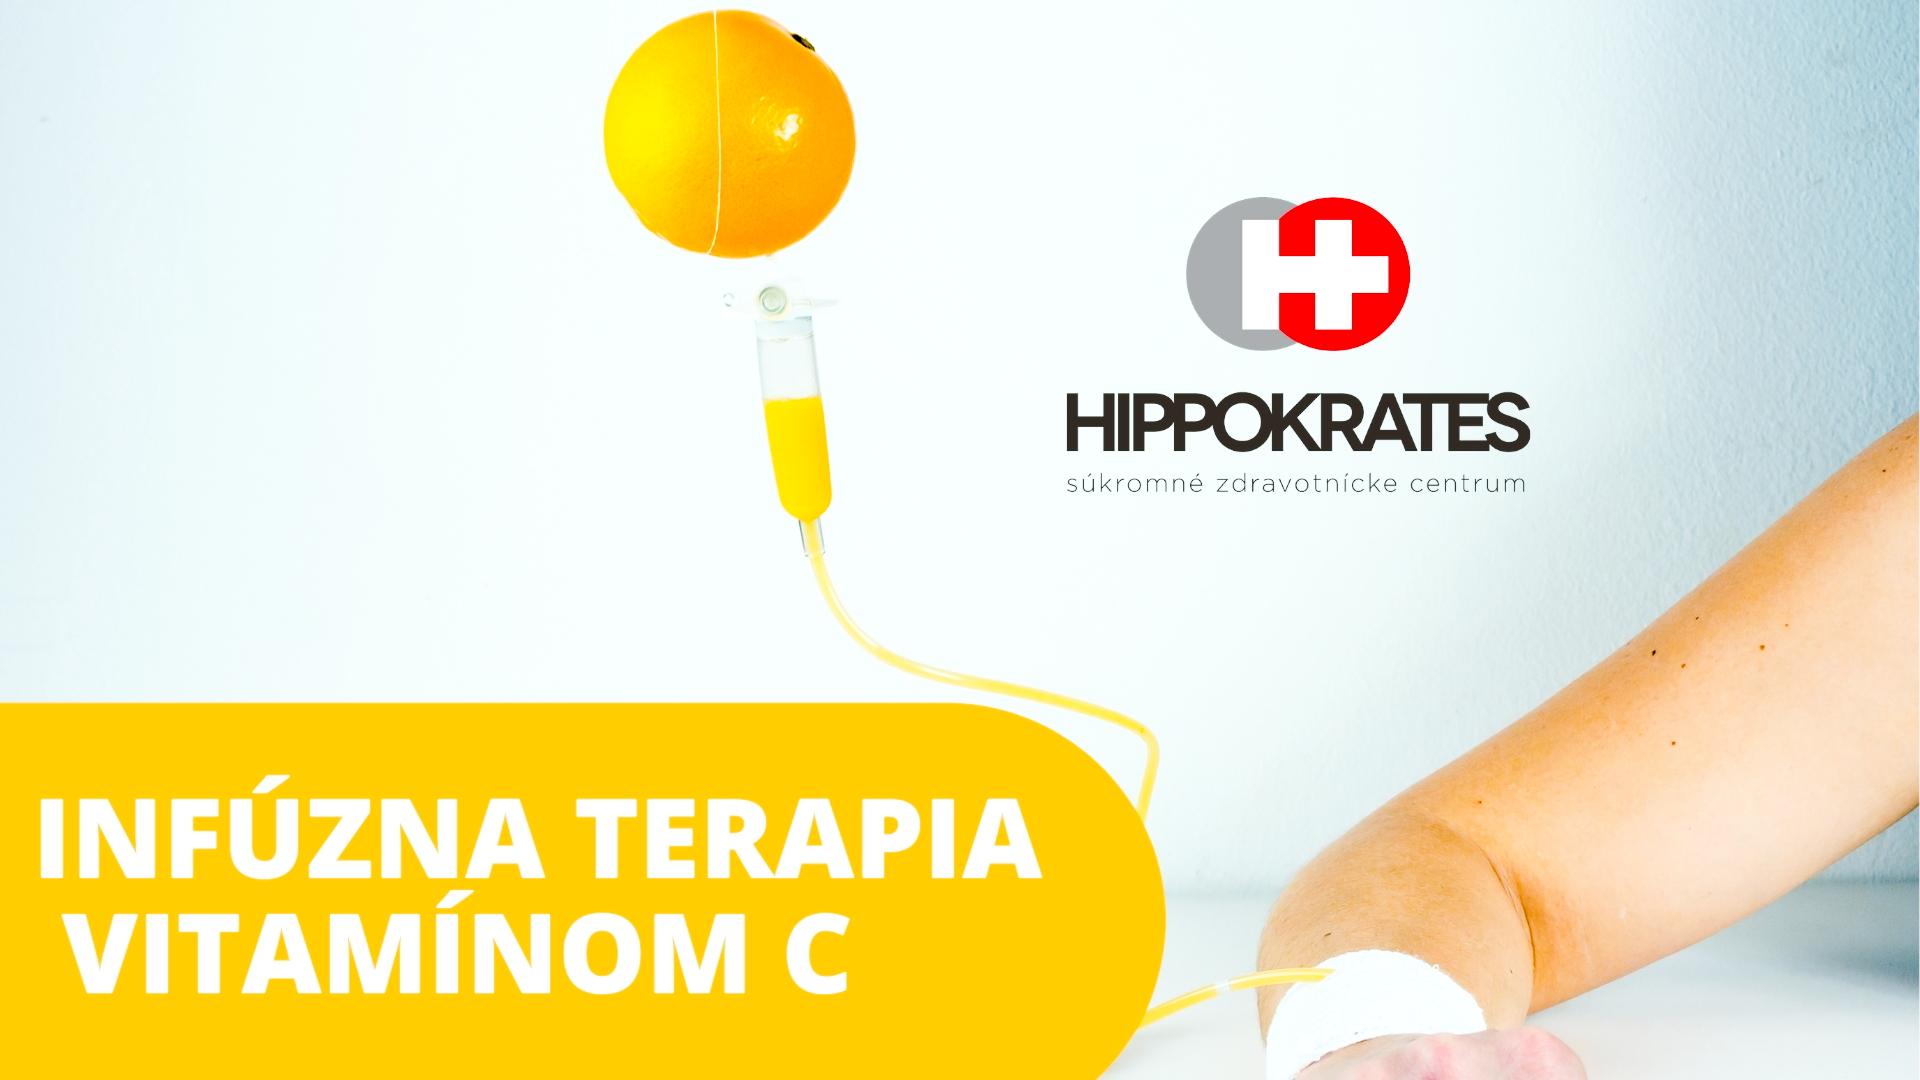 INFÚZNA TERAPIA VITAMÍNOM C Hippokrates